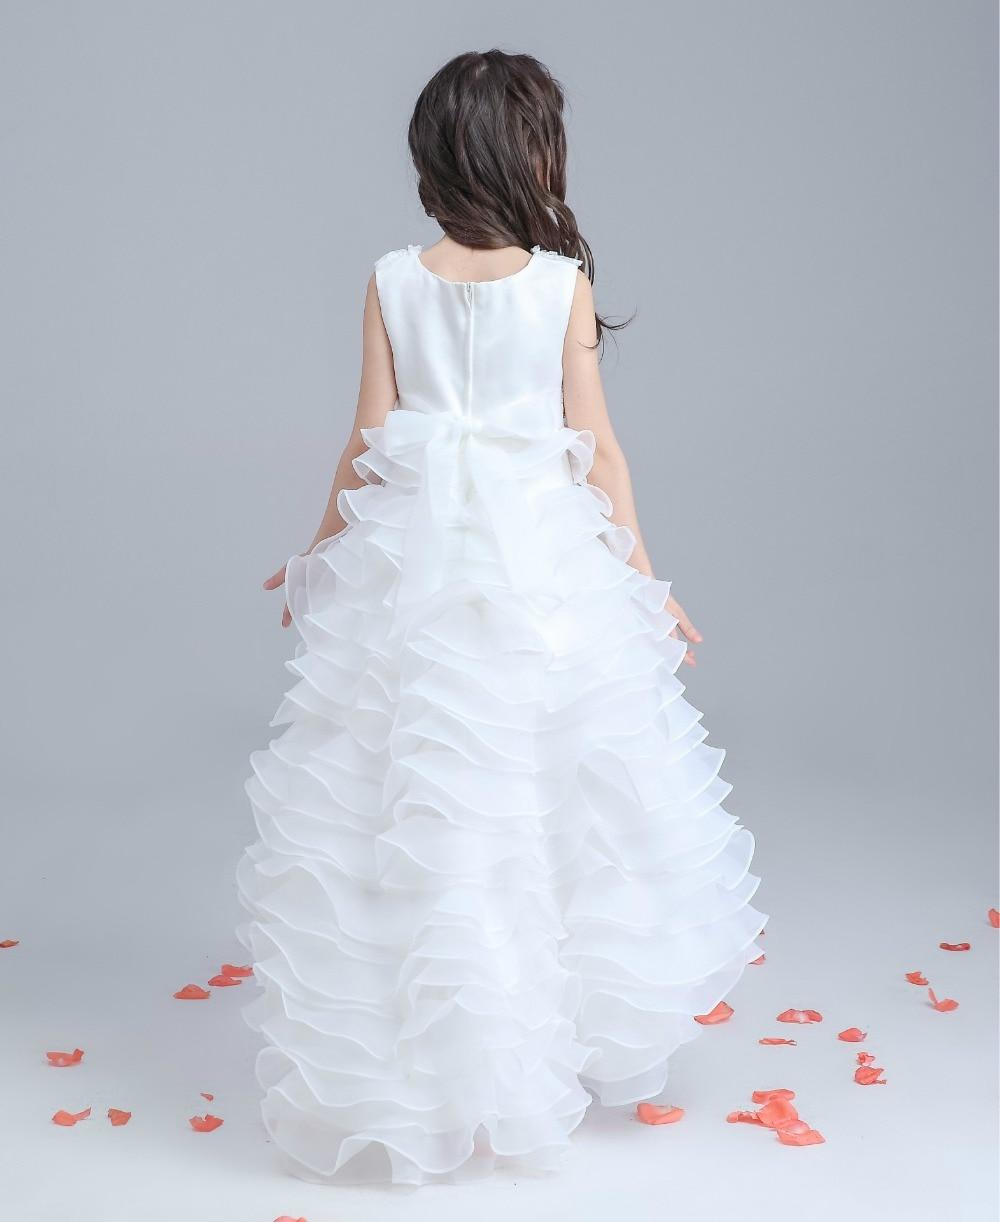 Girl Tail Dress Red White Kids Trumpet Mermaid Clothing Formal ...